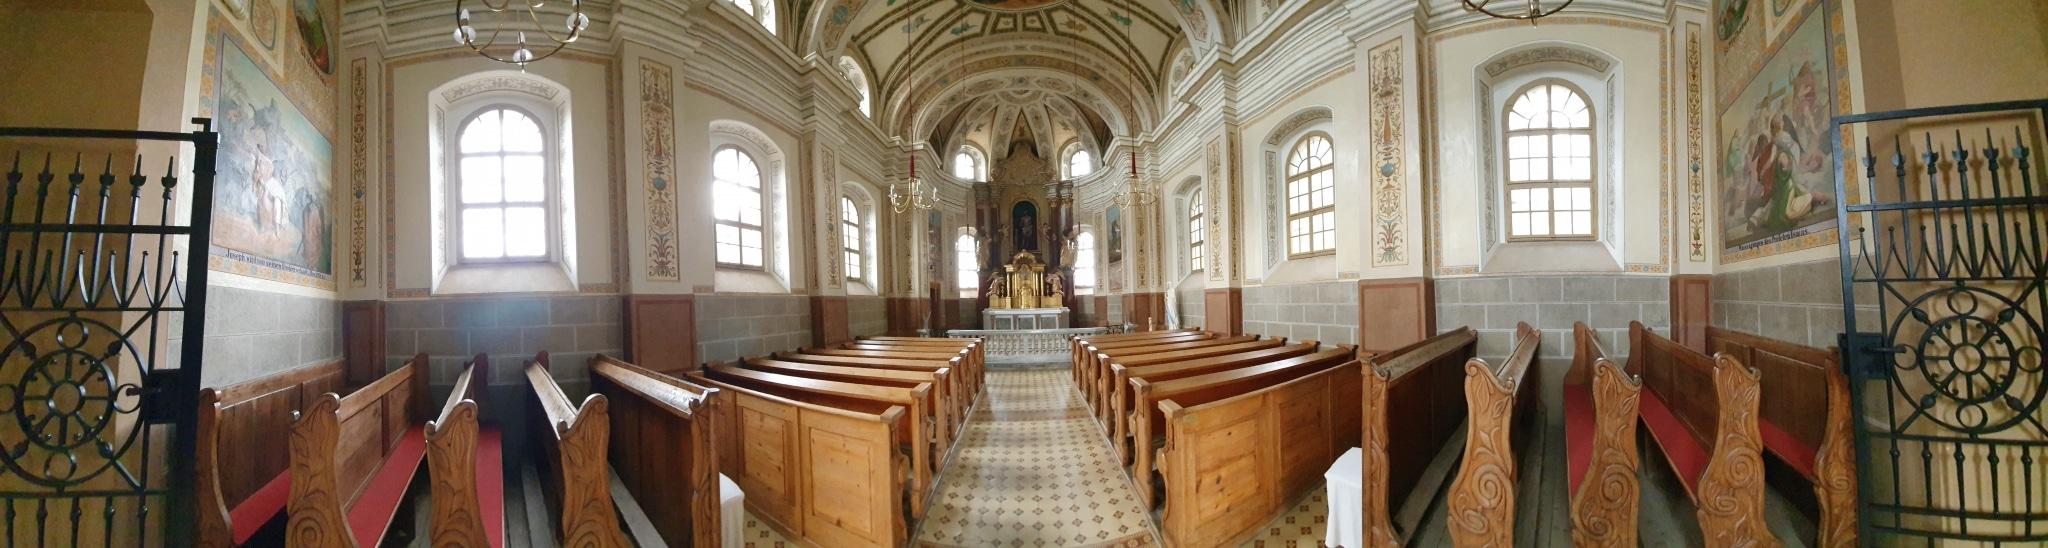 Breiteggerkirche